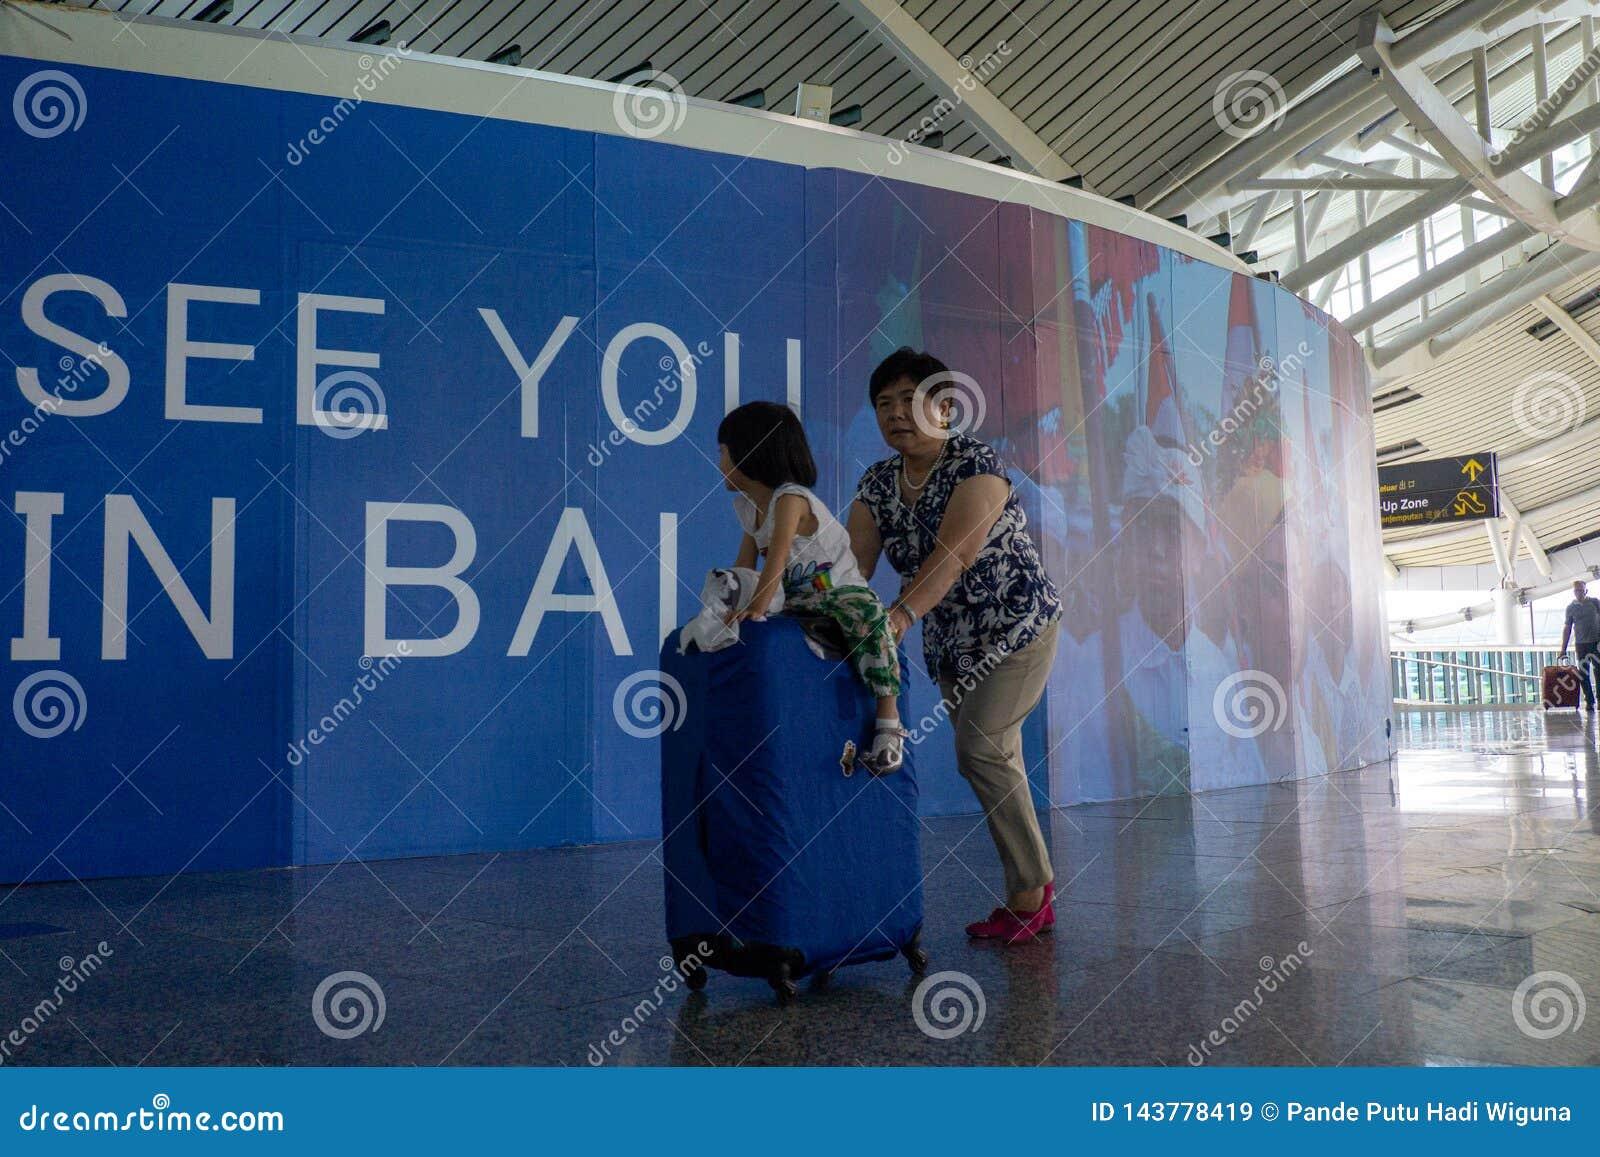 BADUNG, BALI/INDONESIA- 25 Ιουνίου 2018: Η μητέρα και λίγη κόρη φέρνουν τη βαλίτσα τους στο τερματικό αναχώρησης σε Ngurah Rai Μπ